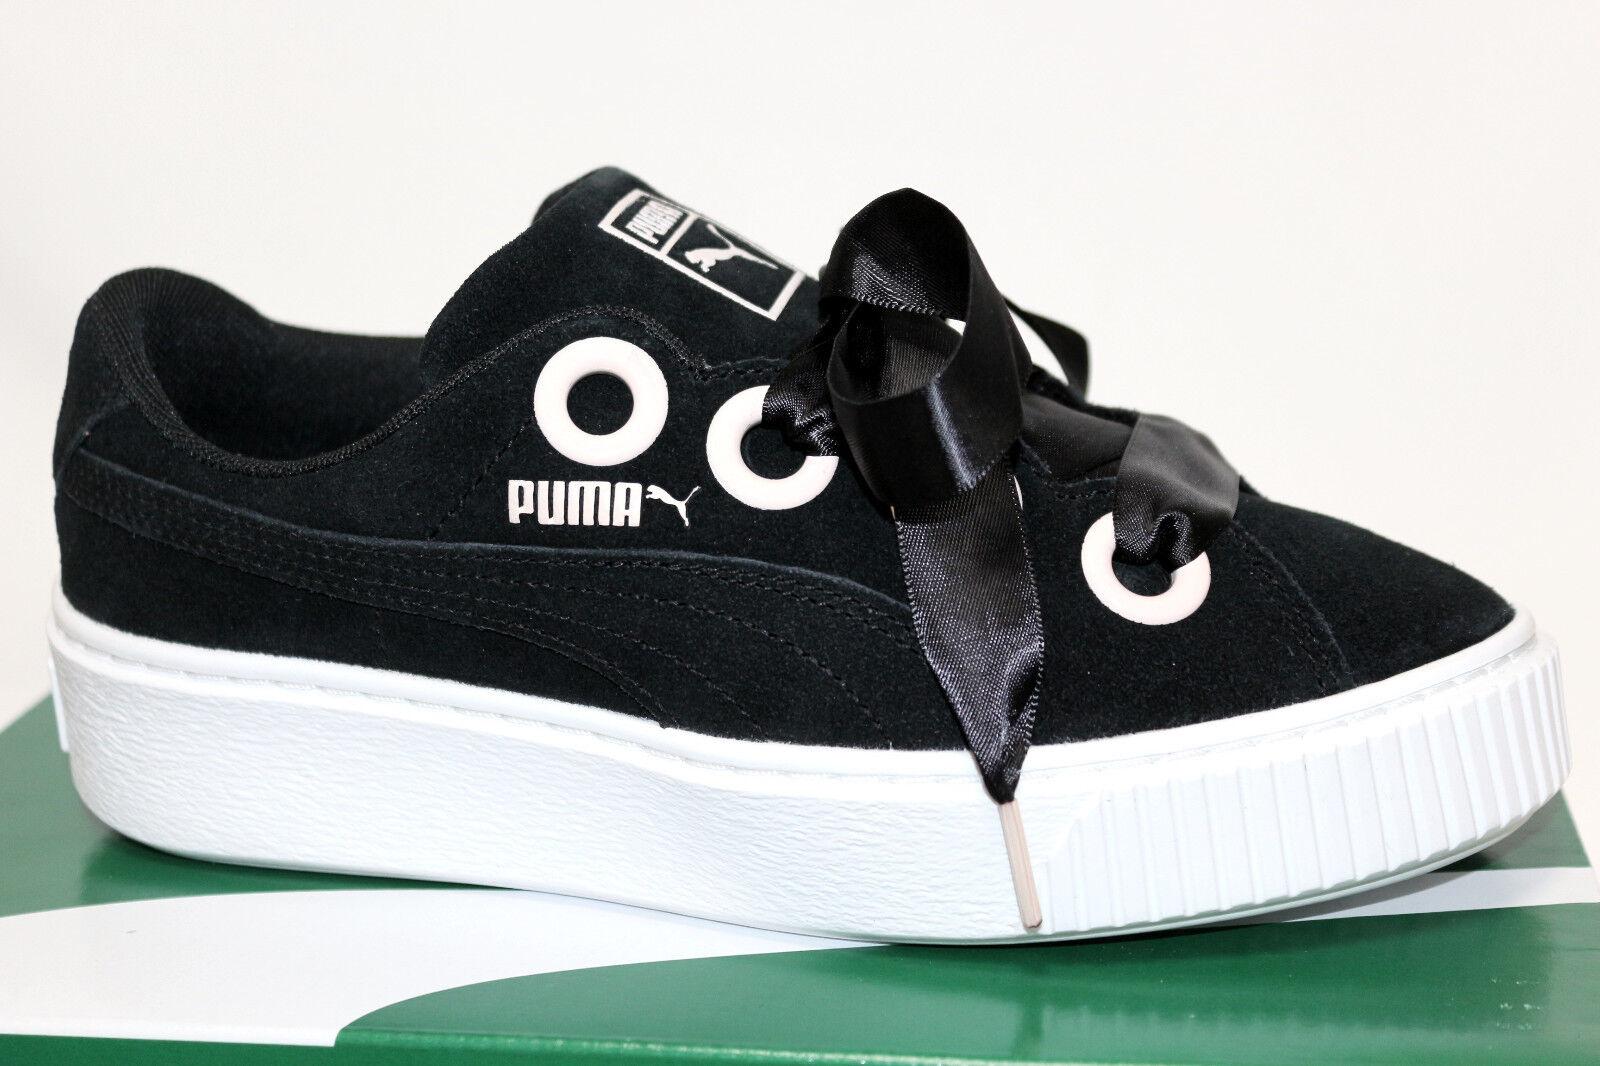 PUMA PLATFORM KISS SD JR 367459 01 chaussures baskets  LEDER noir  Taille WÄHLBAR